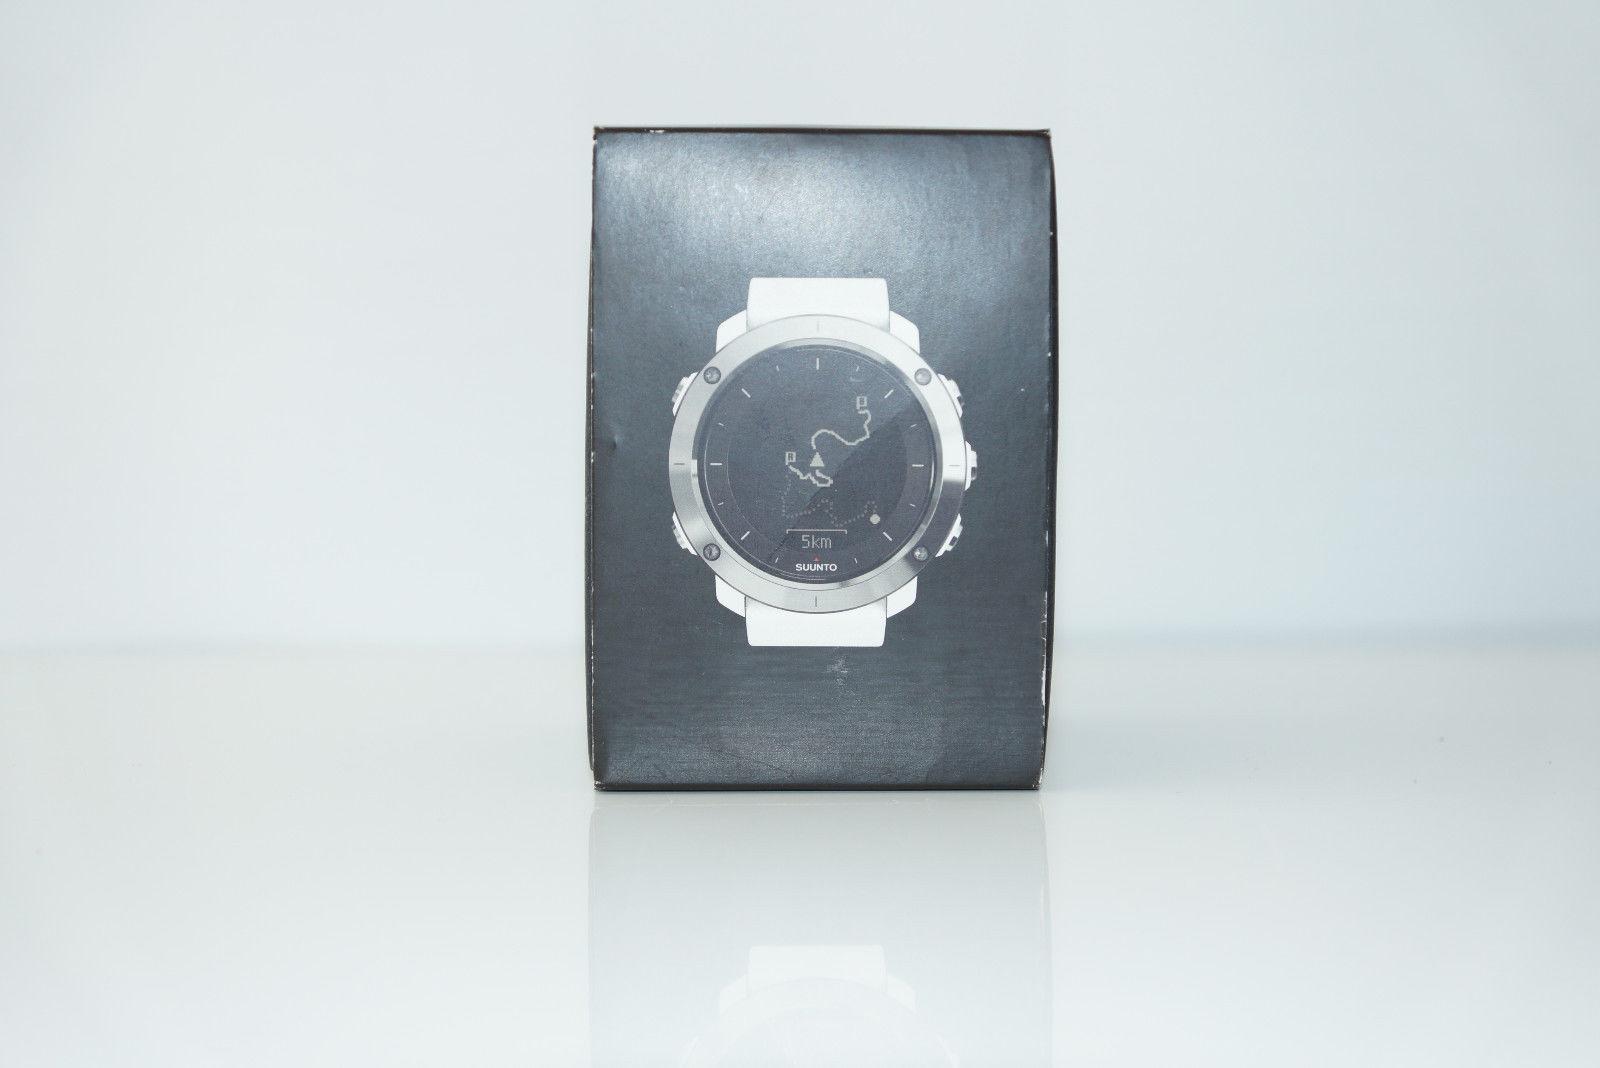 Suunto Traverse white Outdooruhr GPS- Uhr Armbanduhr Originalverpackt